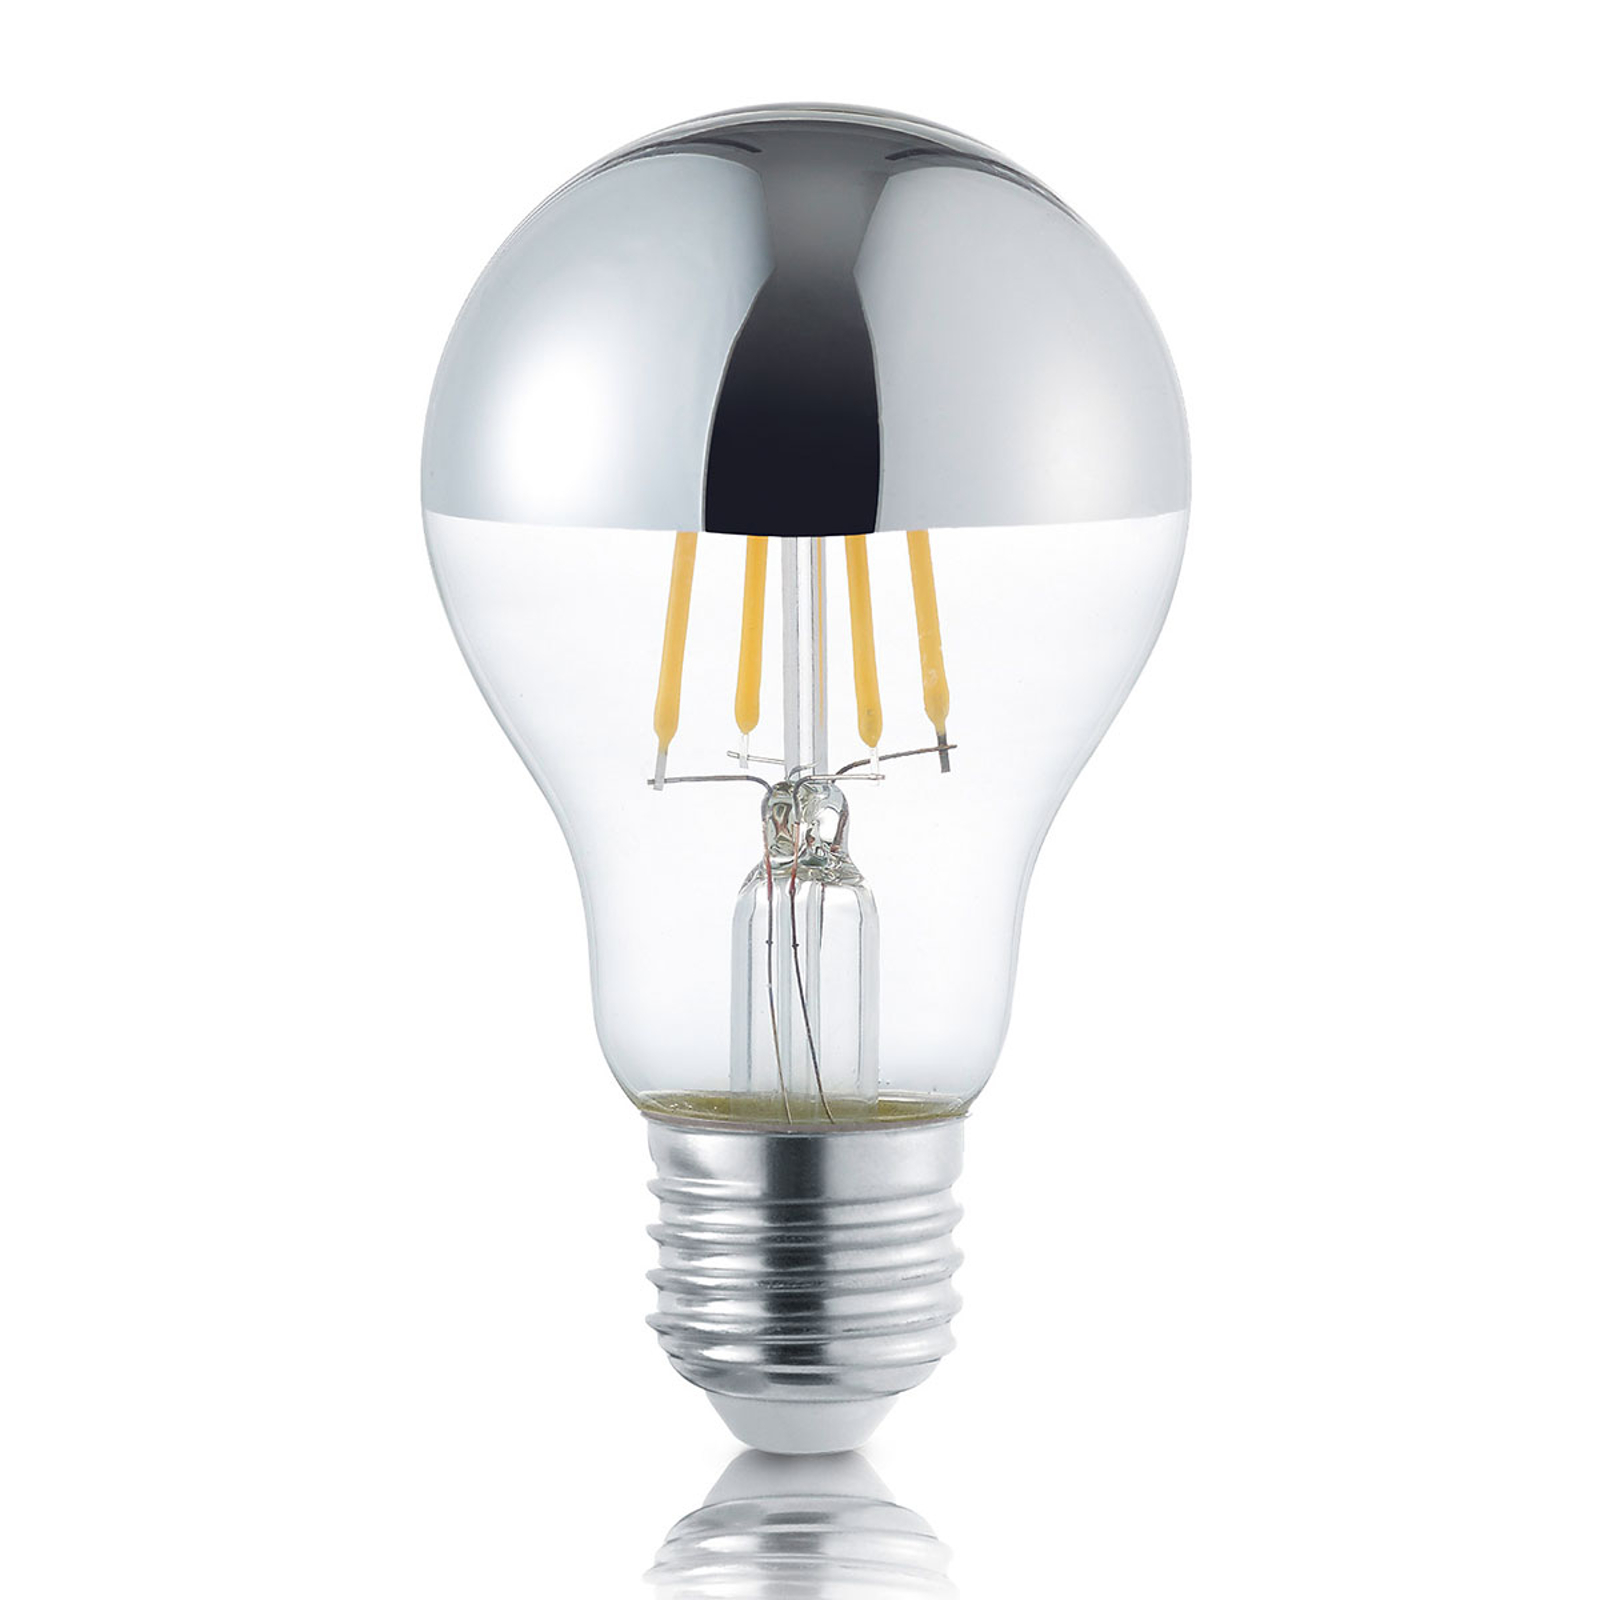 LED-Kopfspiegellampe E27 4W, warmweiß